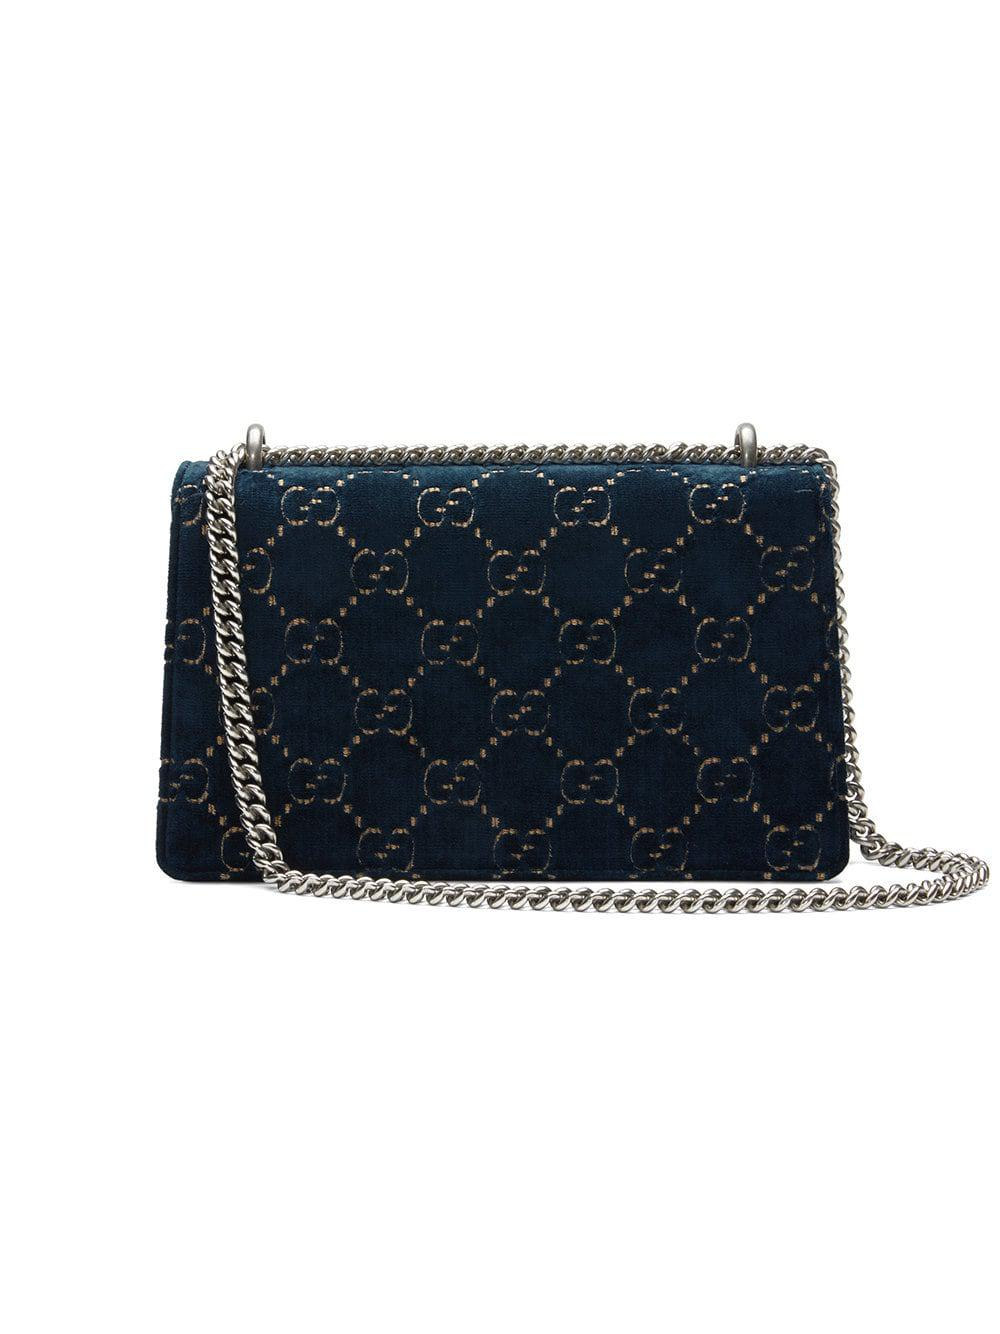 dc2f75094a4 Lyst - Gucci Dionysus GG Velvet Small Shoulder Bag in Black